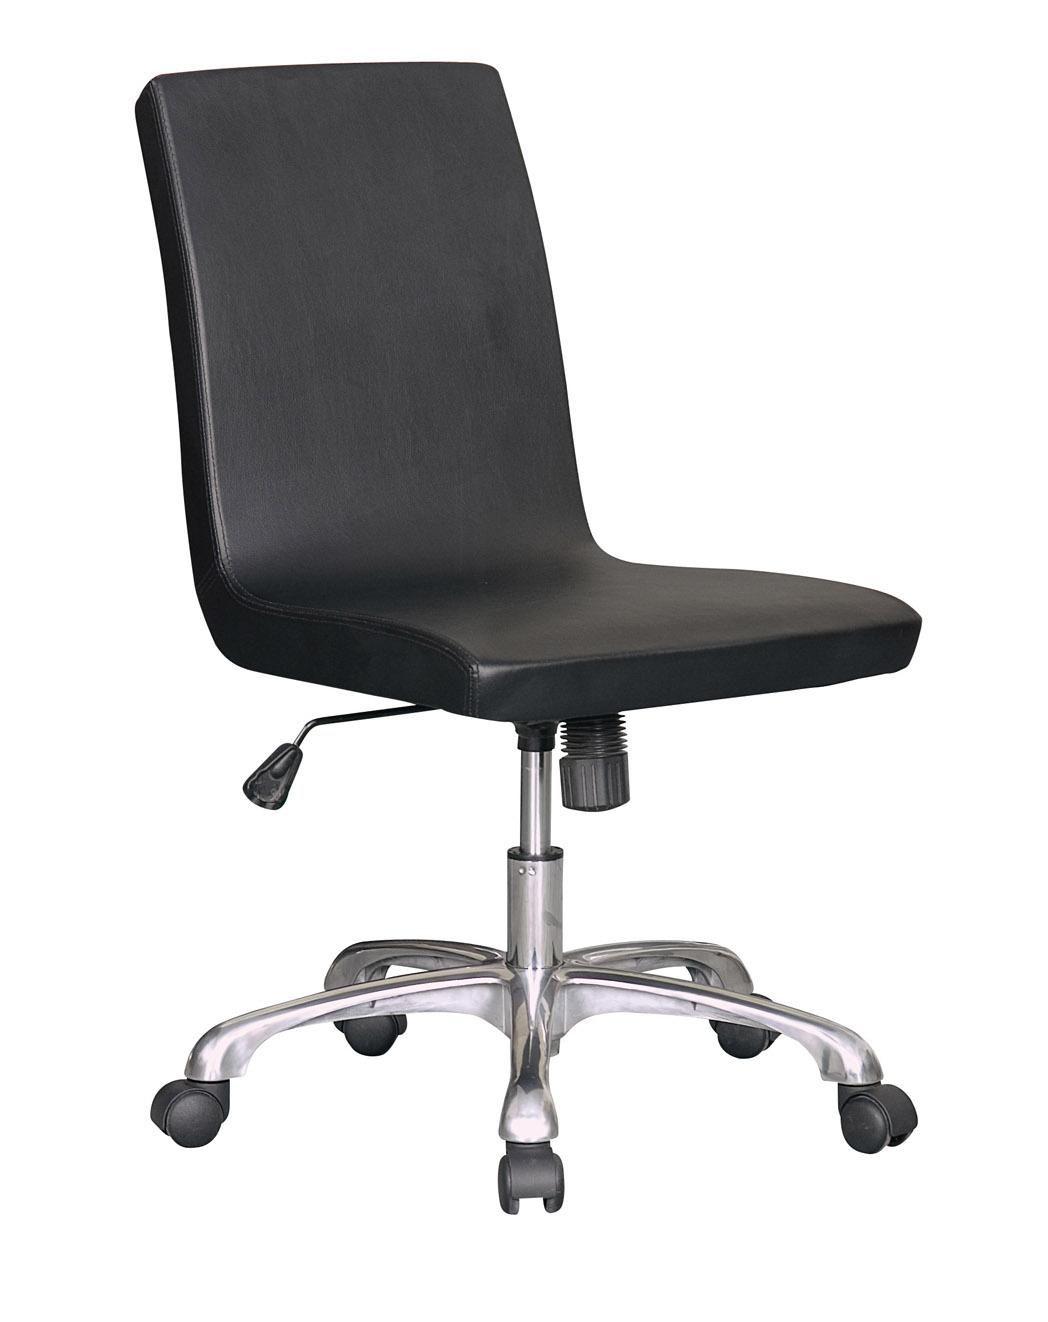 Bürostühle milwaukee | BüroMöbel | Pinterest | Büromöbel